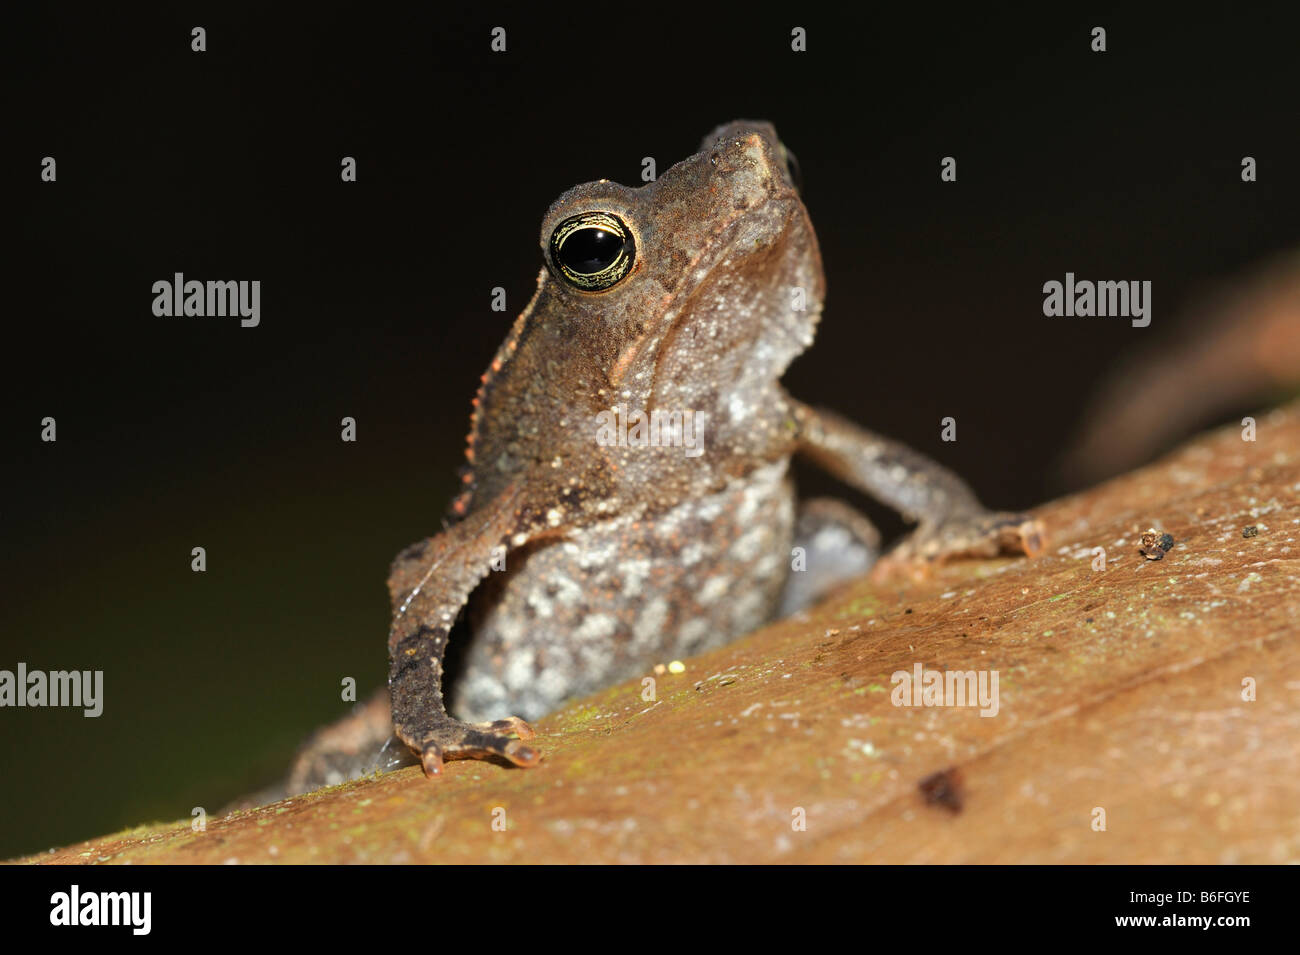 South American Common Toad or Sapo Crestado (Rhinella margaritifer) in the rain forest of Ecuador, South America - Stock Image